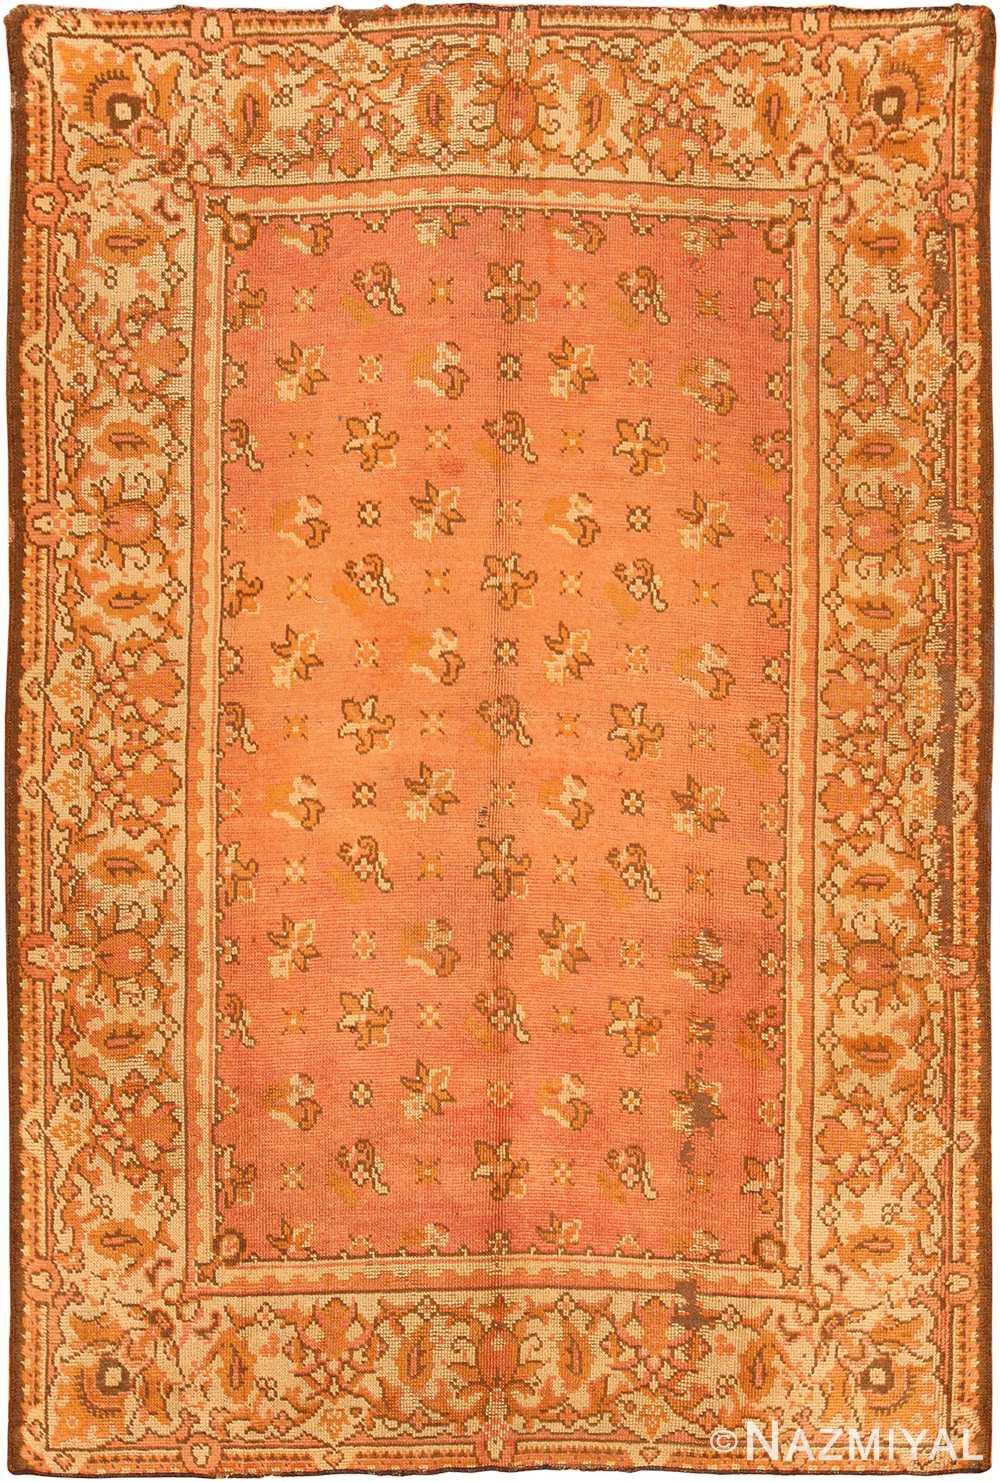 Donegal Carpet 909 Nazmiyal Antique Rugs